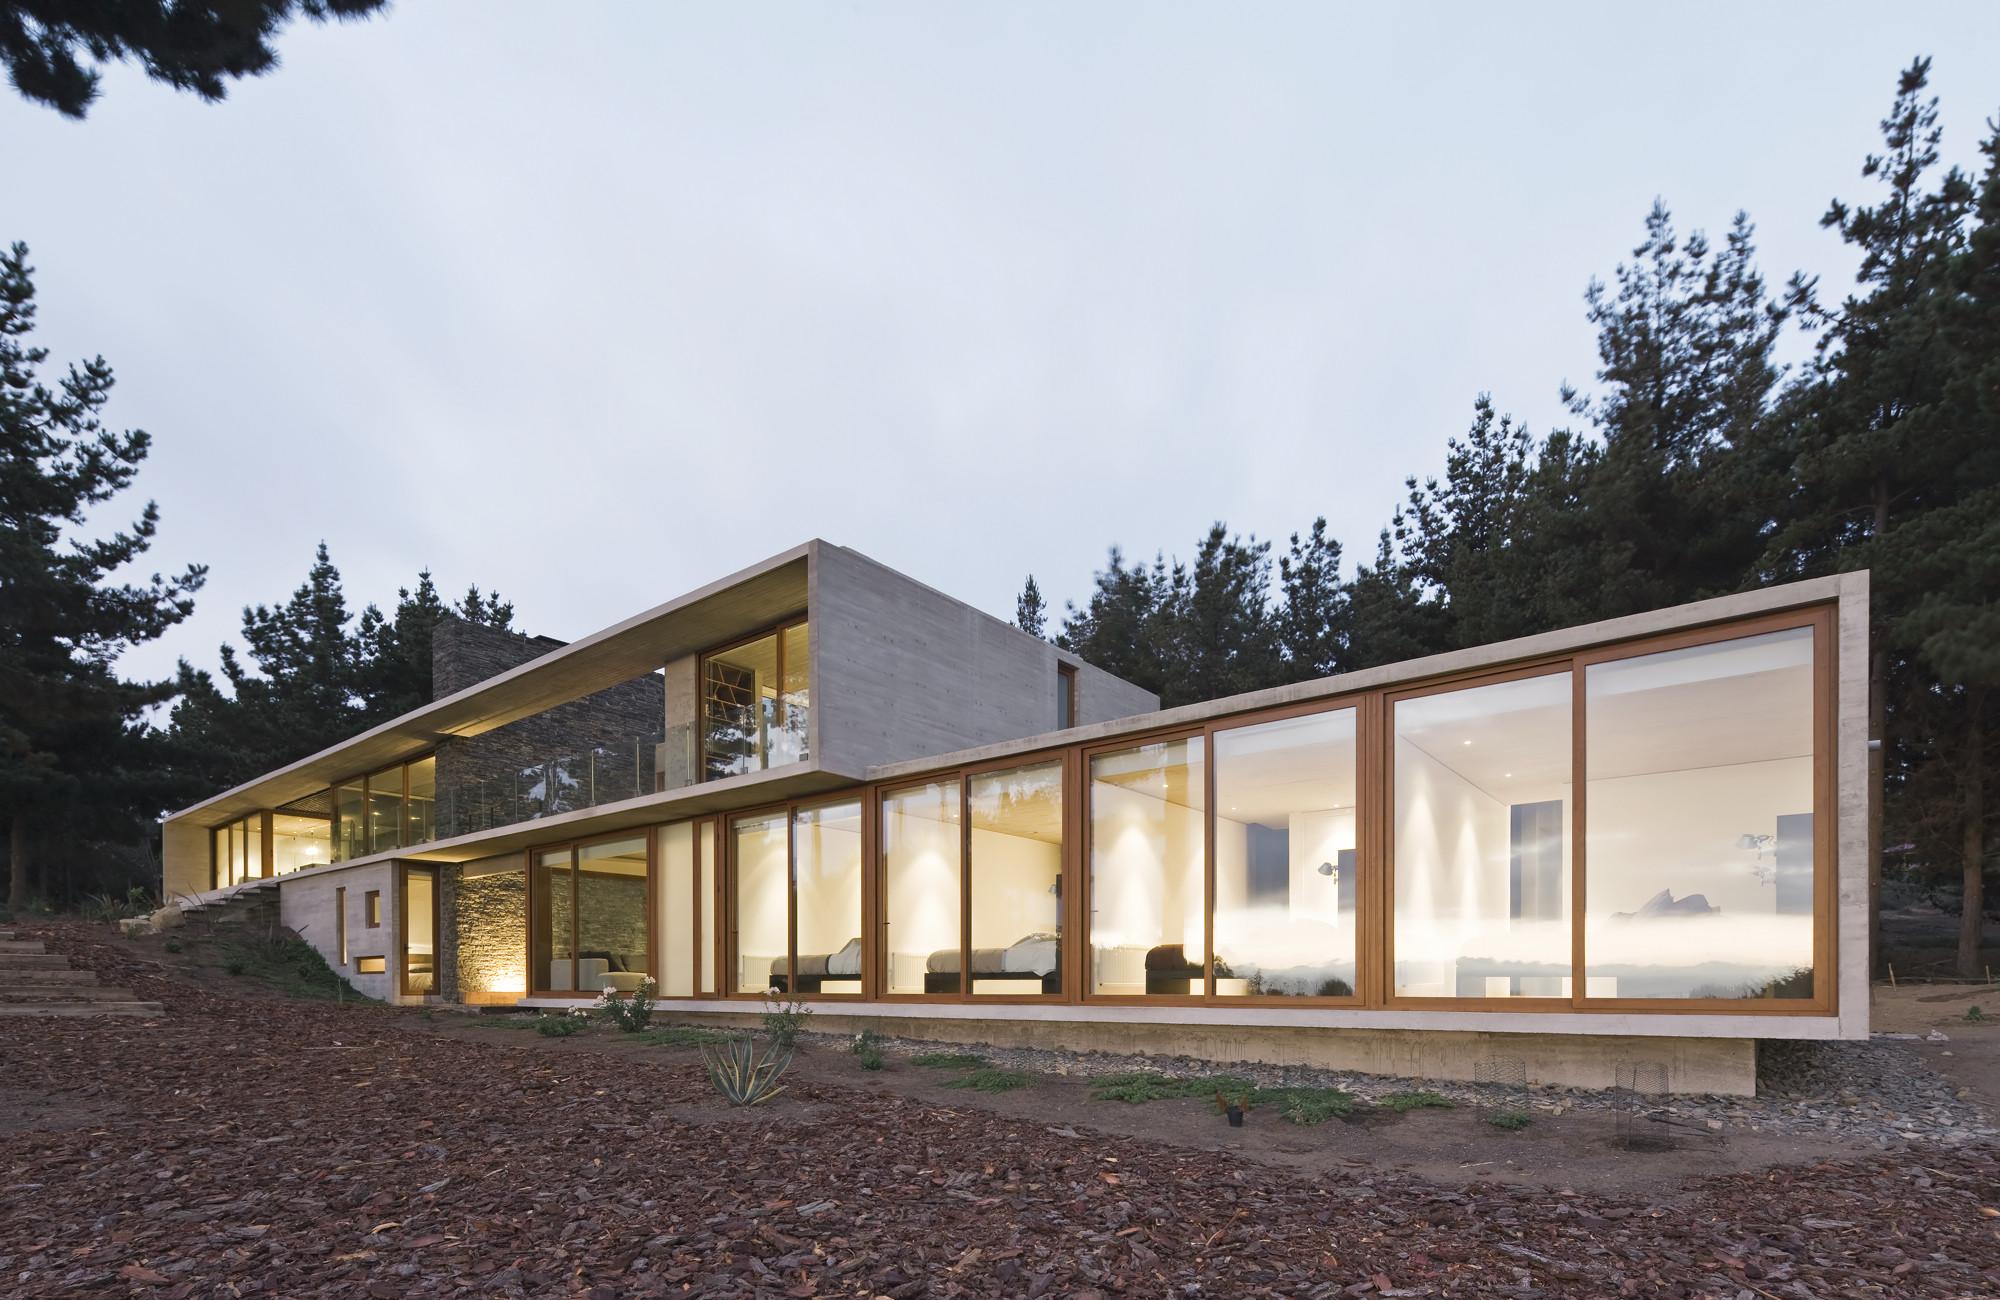 Aguas Claras House / Ramon Coz + Benjamin Ortiz, © Sergio Pirrone